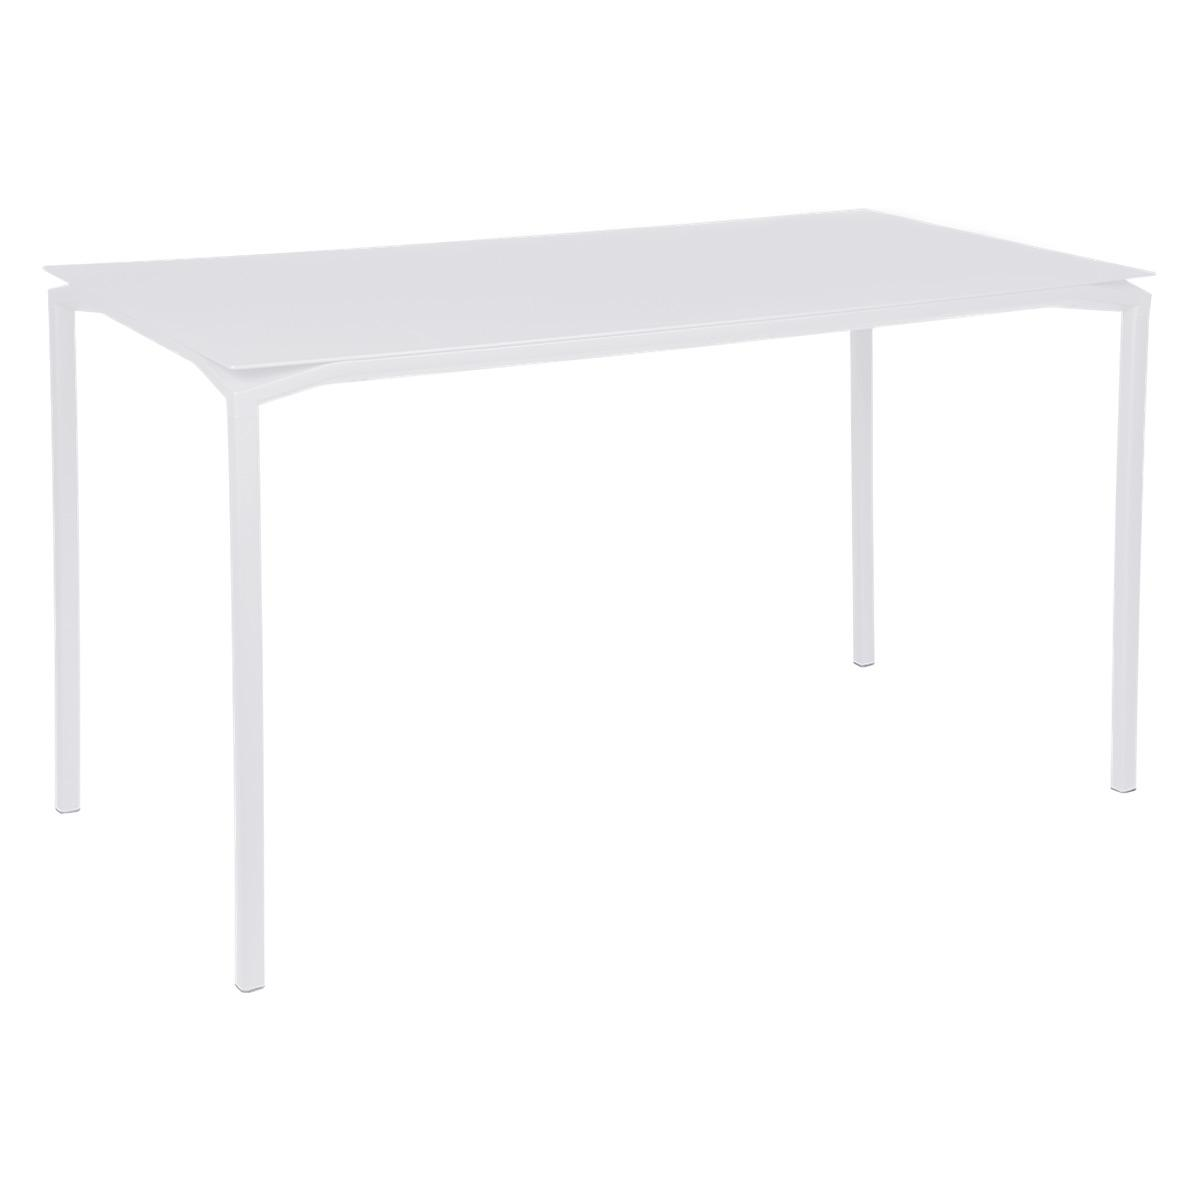 Table 80x160cm CALVI Fermob blanc coton